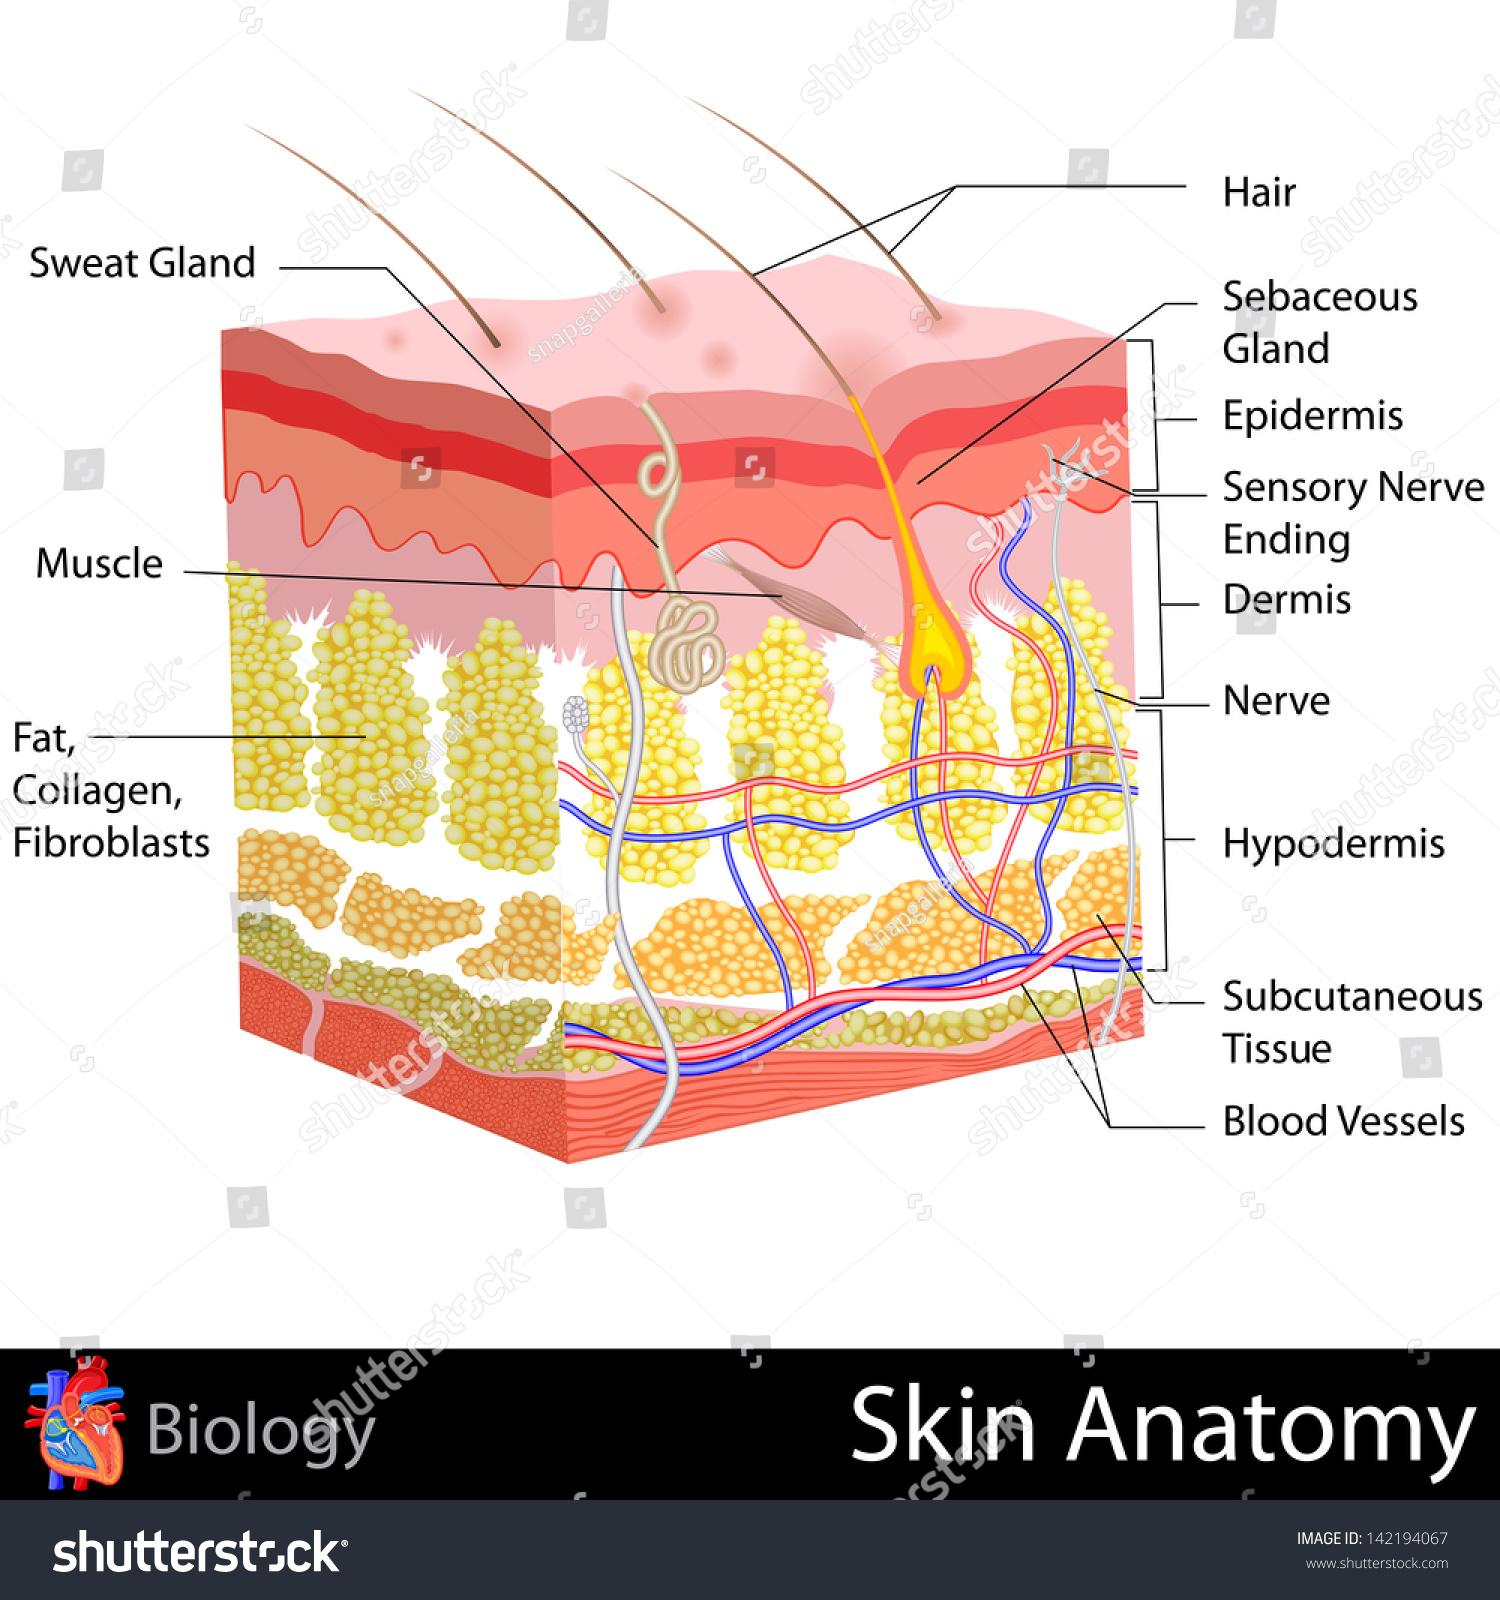 easy to edit vector illustration of skin anatomy diagram  : skin anatomy diagram - findchart.co